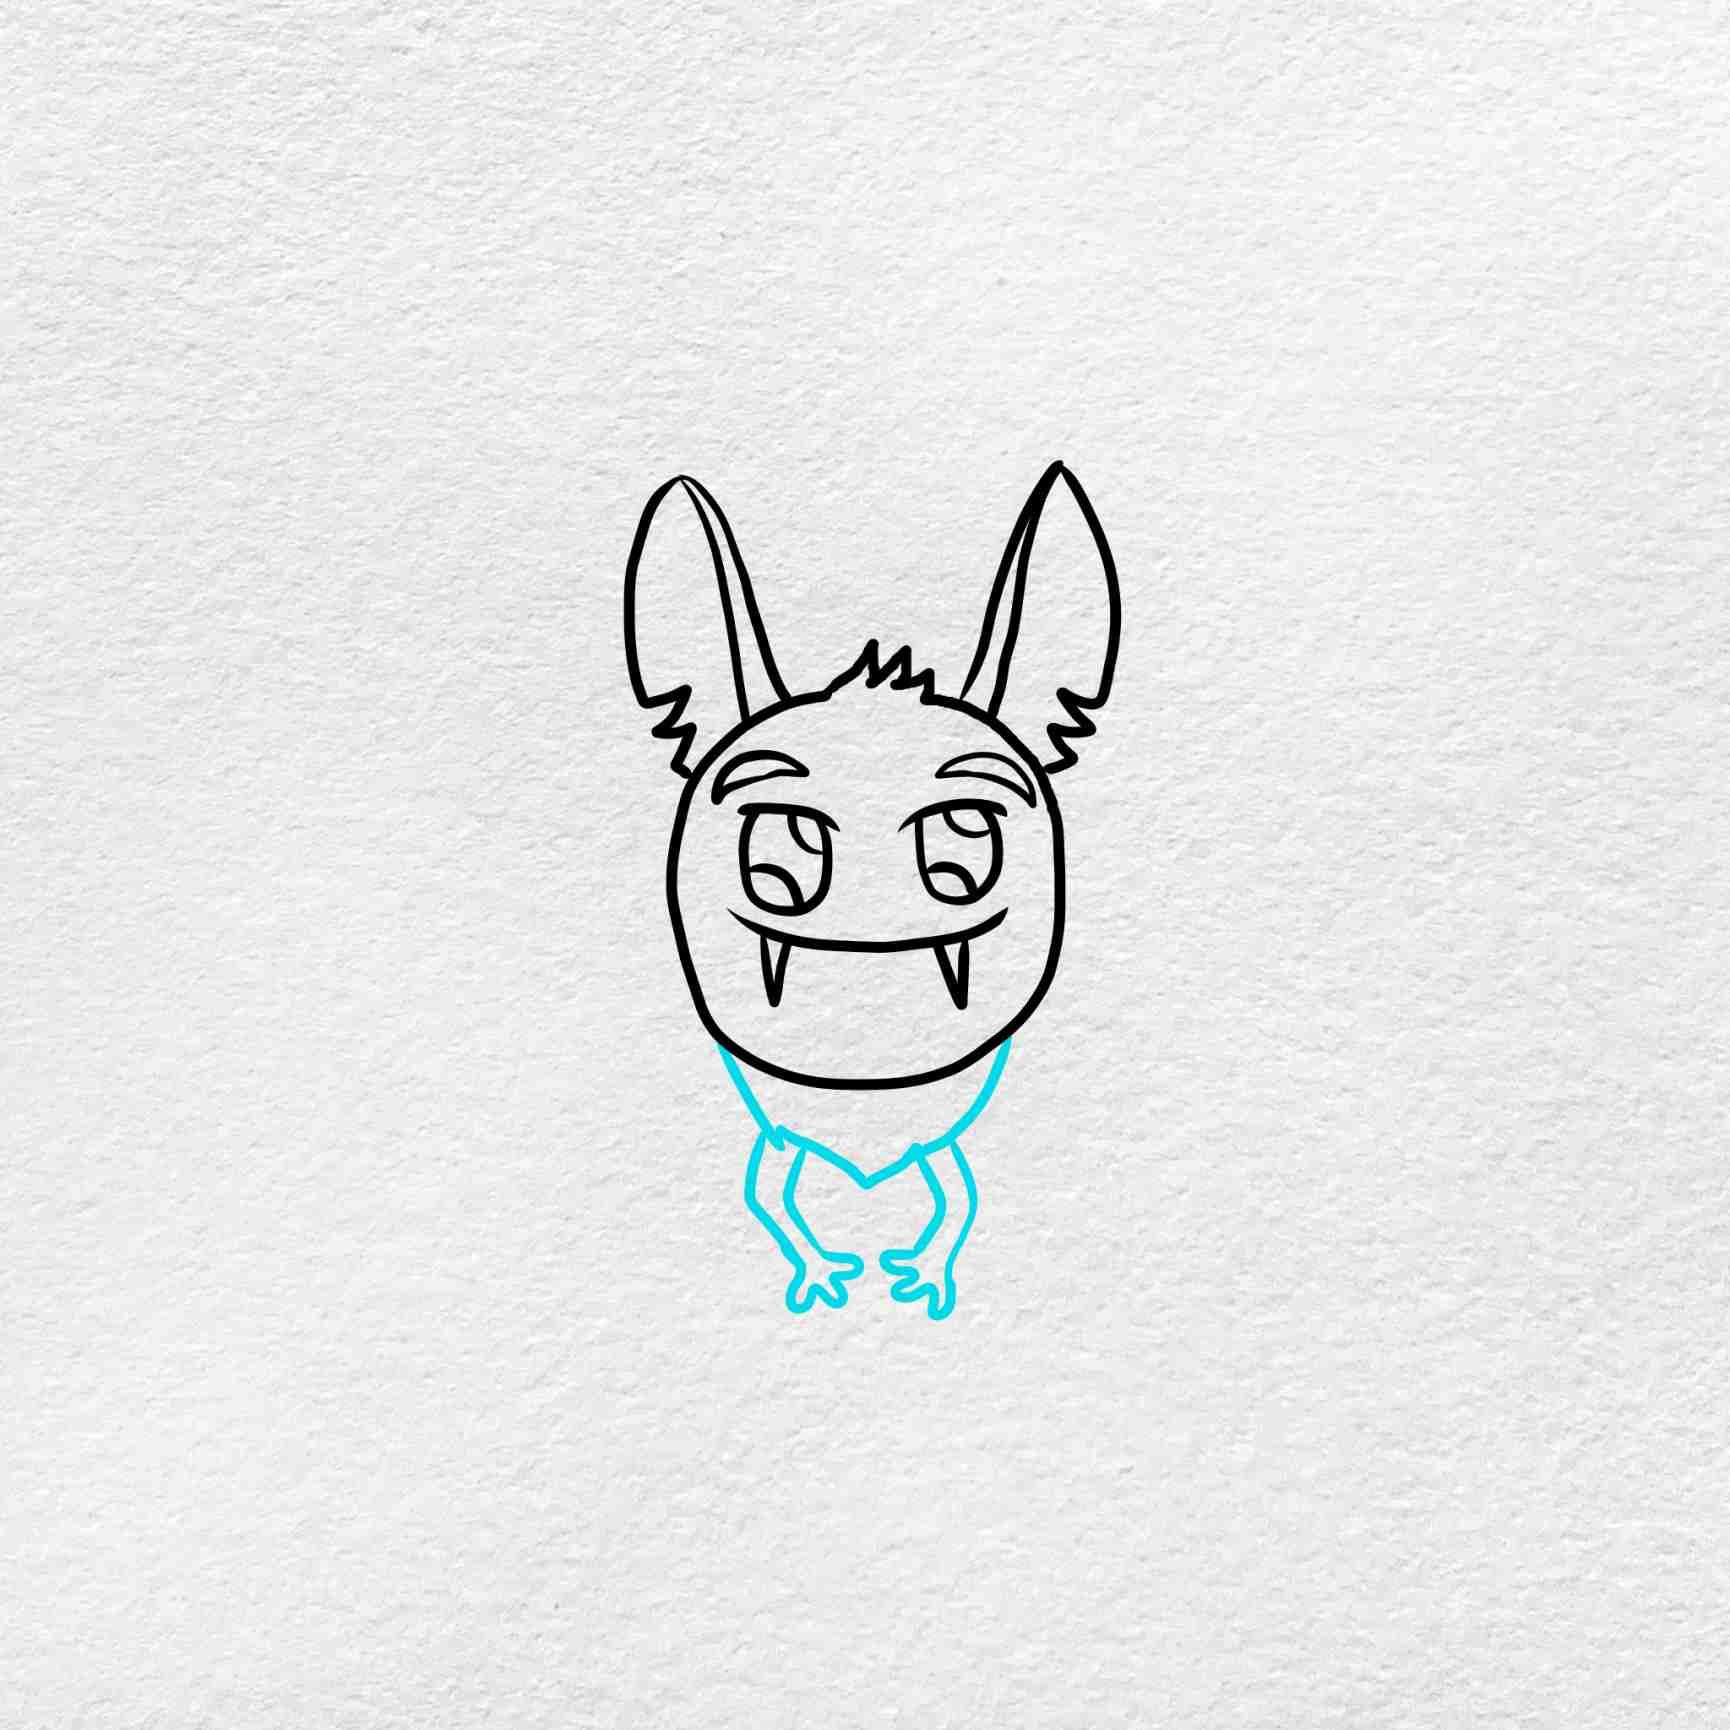 Halloween Bat Drawing: Step 4